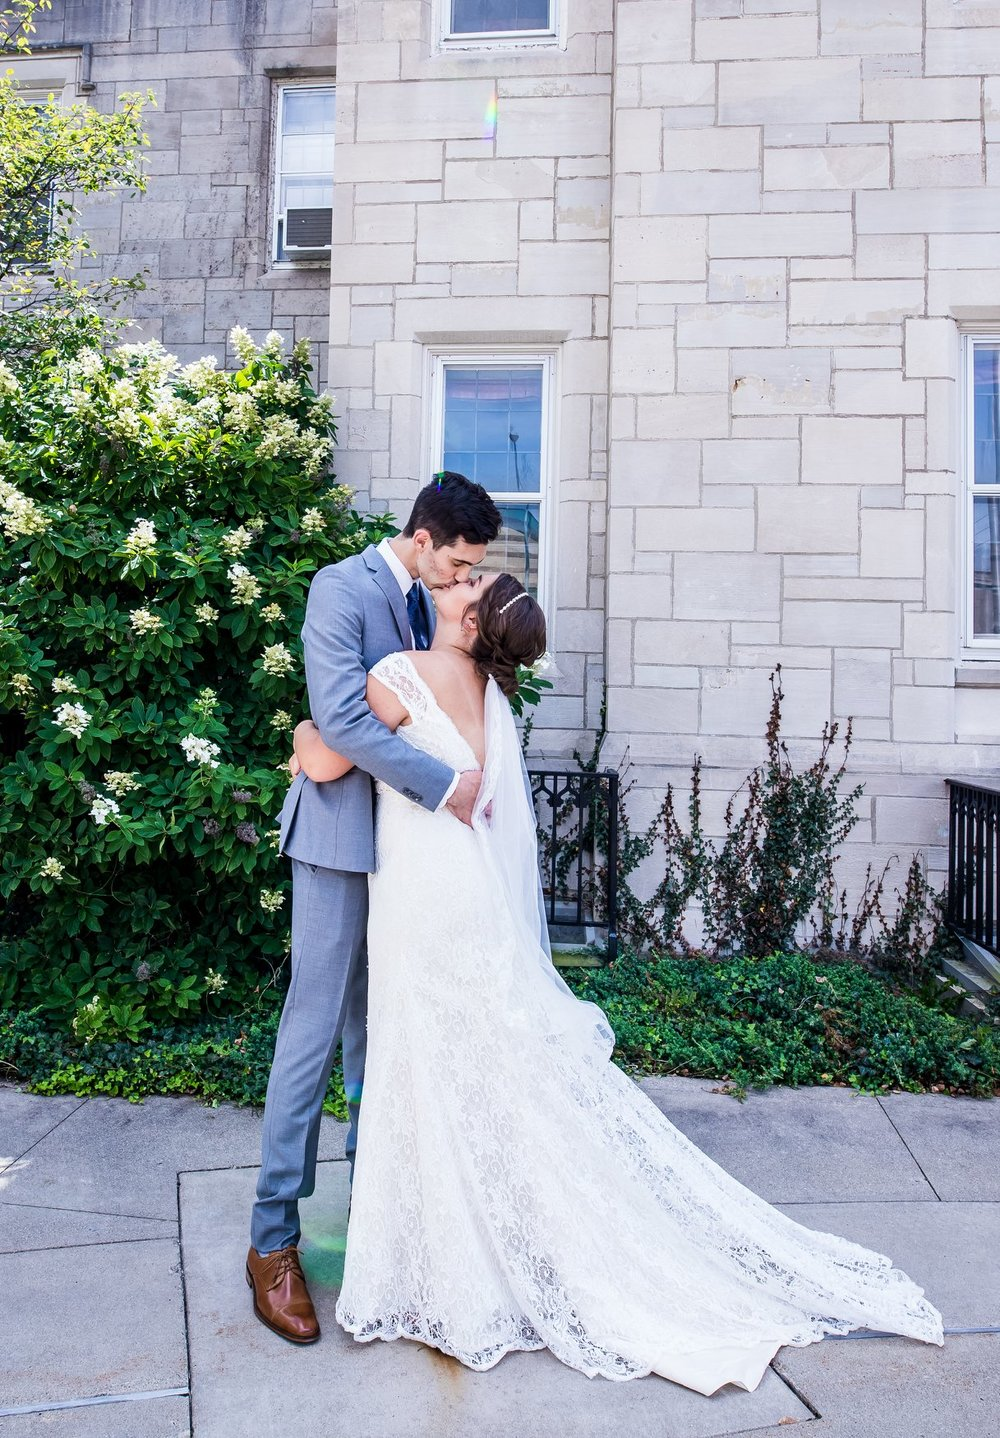 muncie-indiana-wedding-photographer-first-look